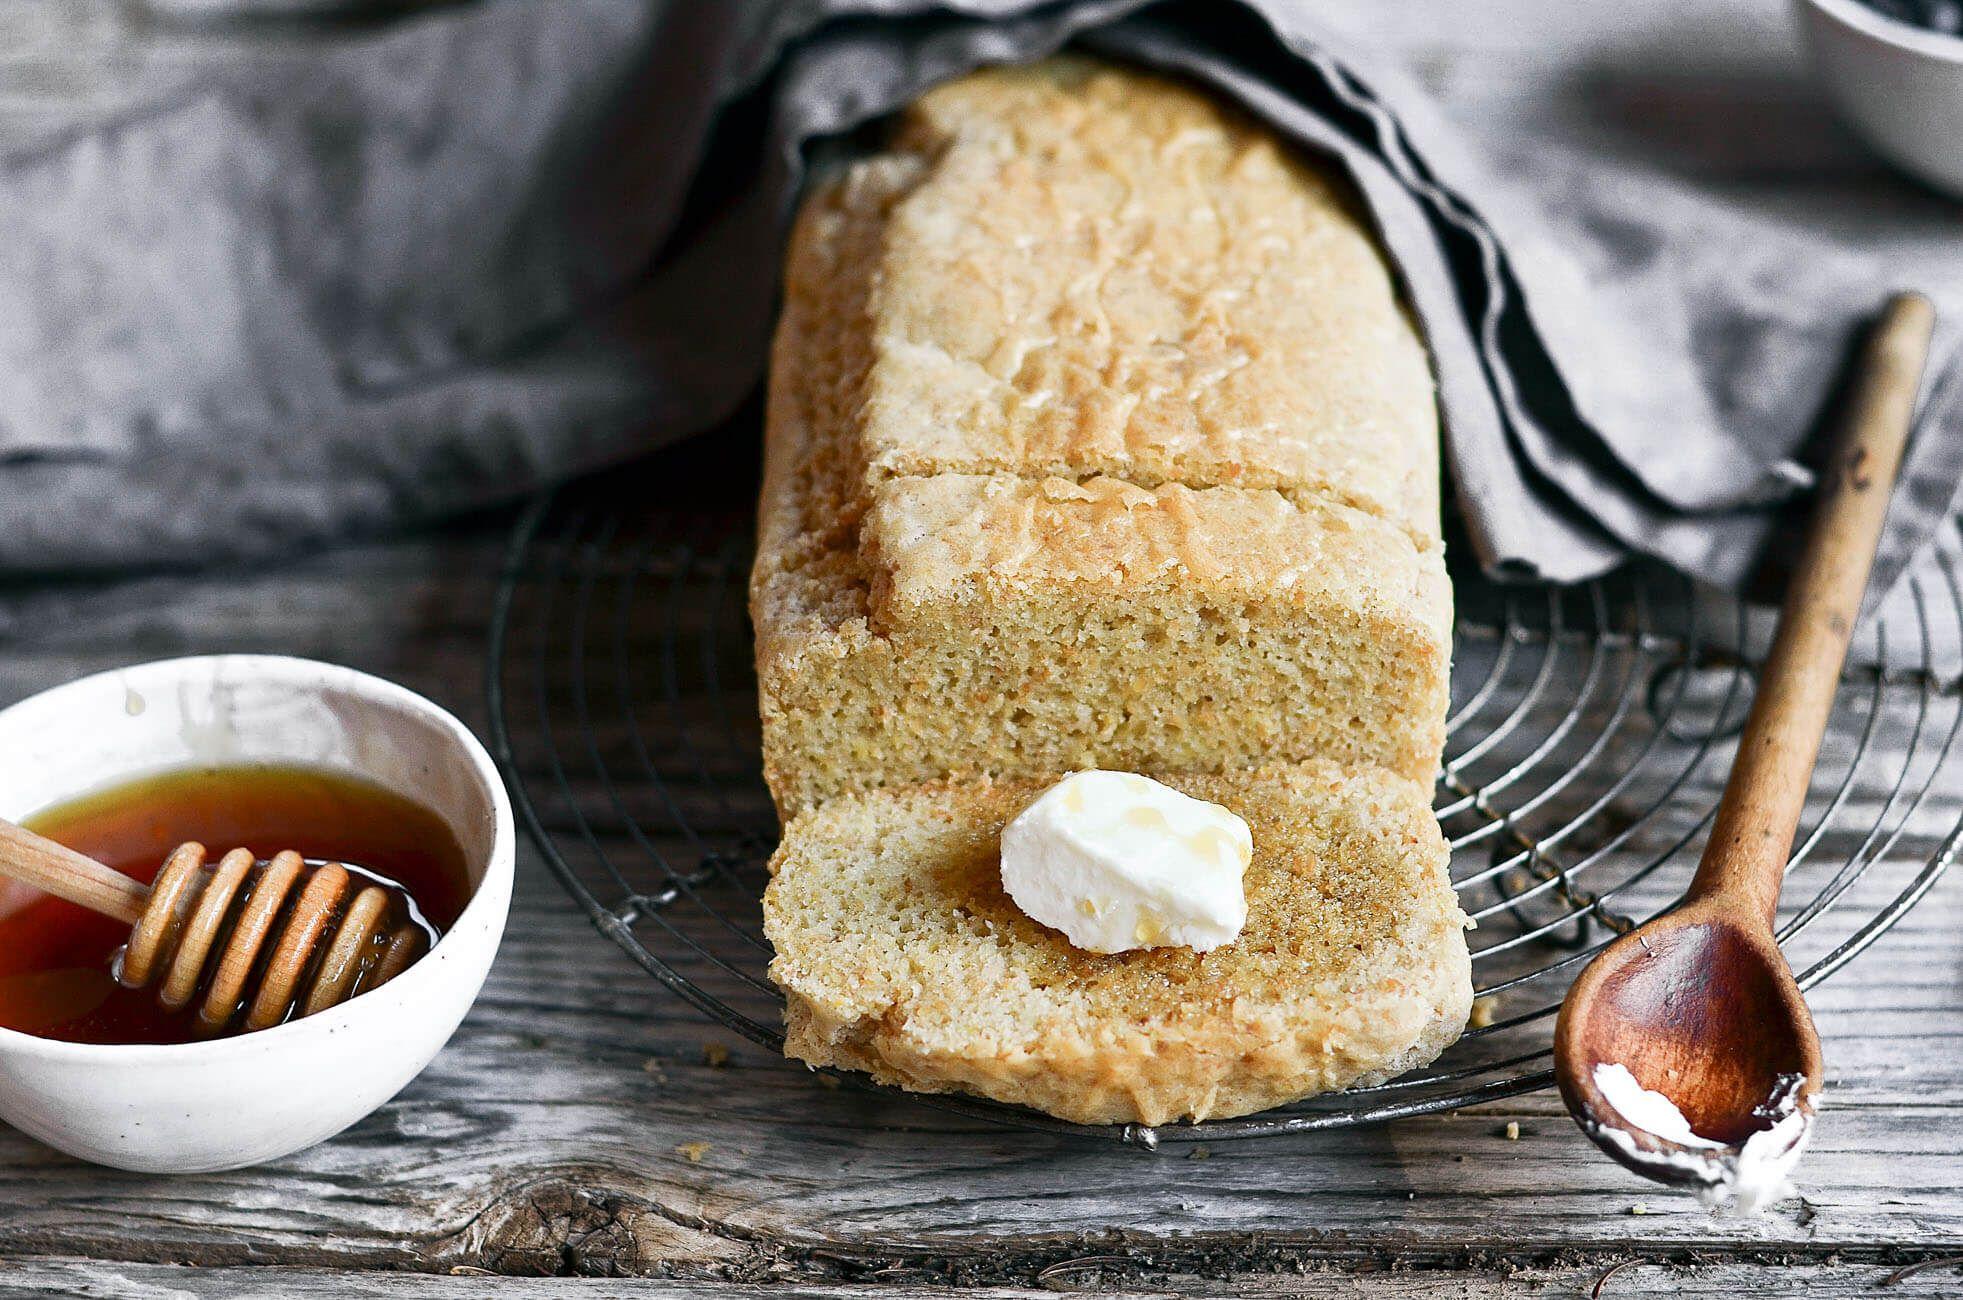 Healthy 5 Minute Gluten Free Paleo Bread Recipe Paleo Gluten